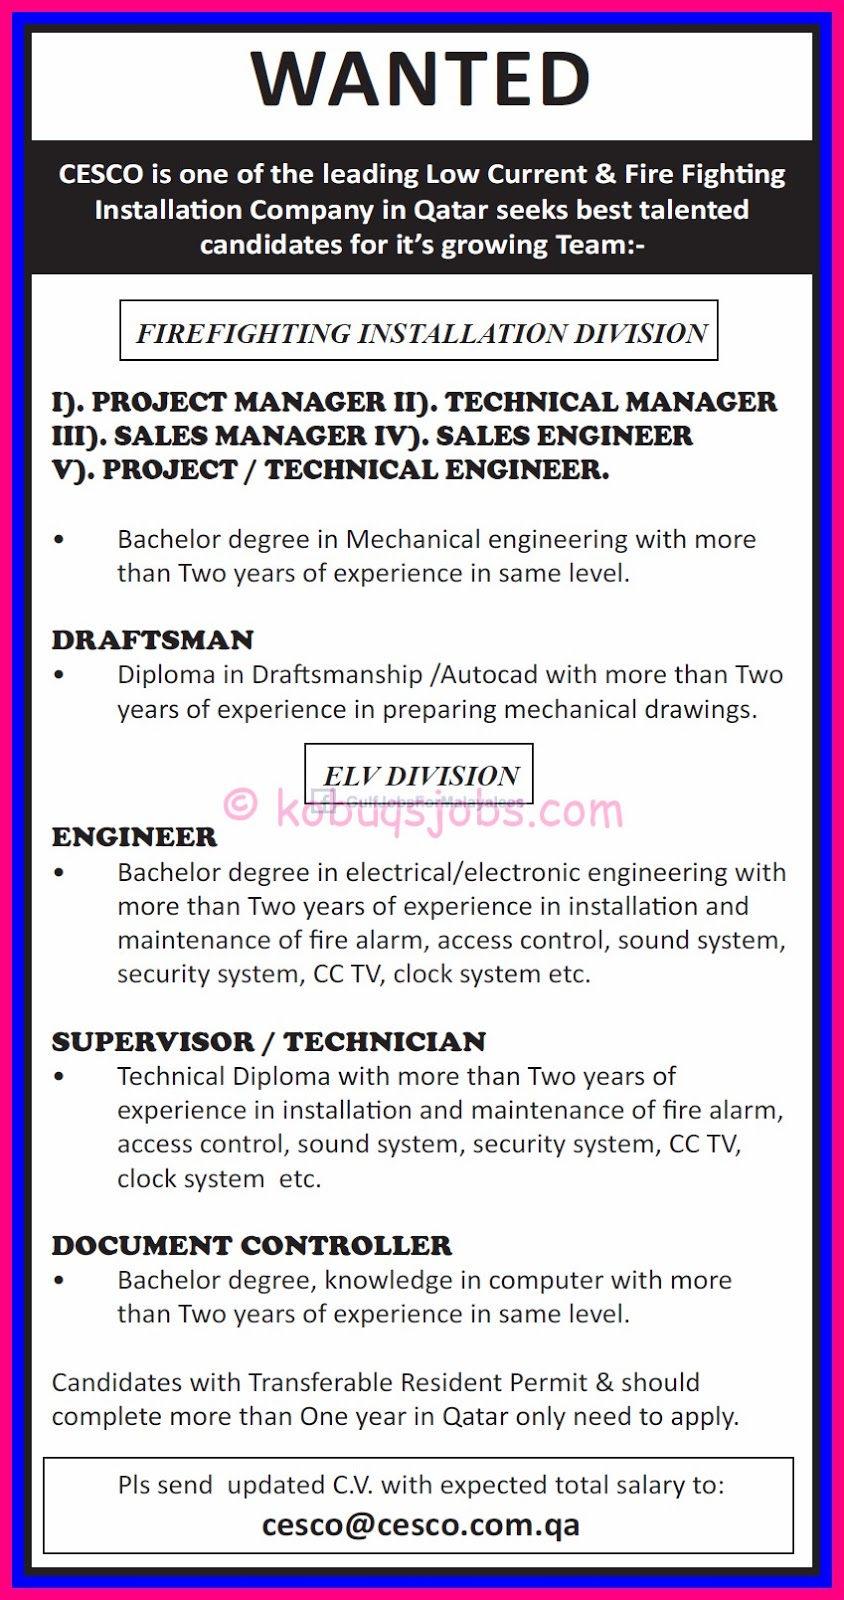 wanted cesco qatar gulf jobs for malayalees wanted cesco qatar engineer document controller